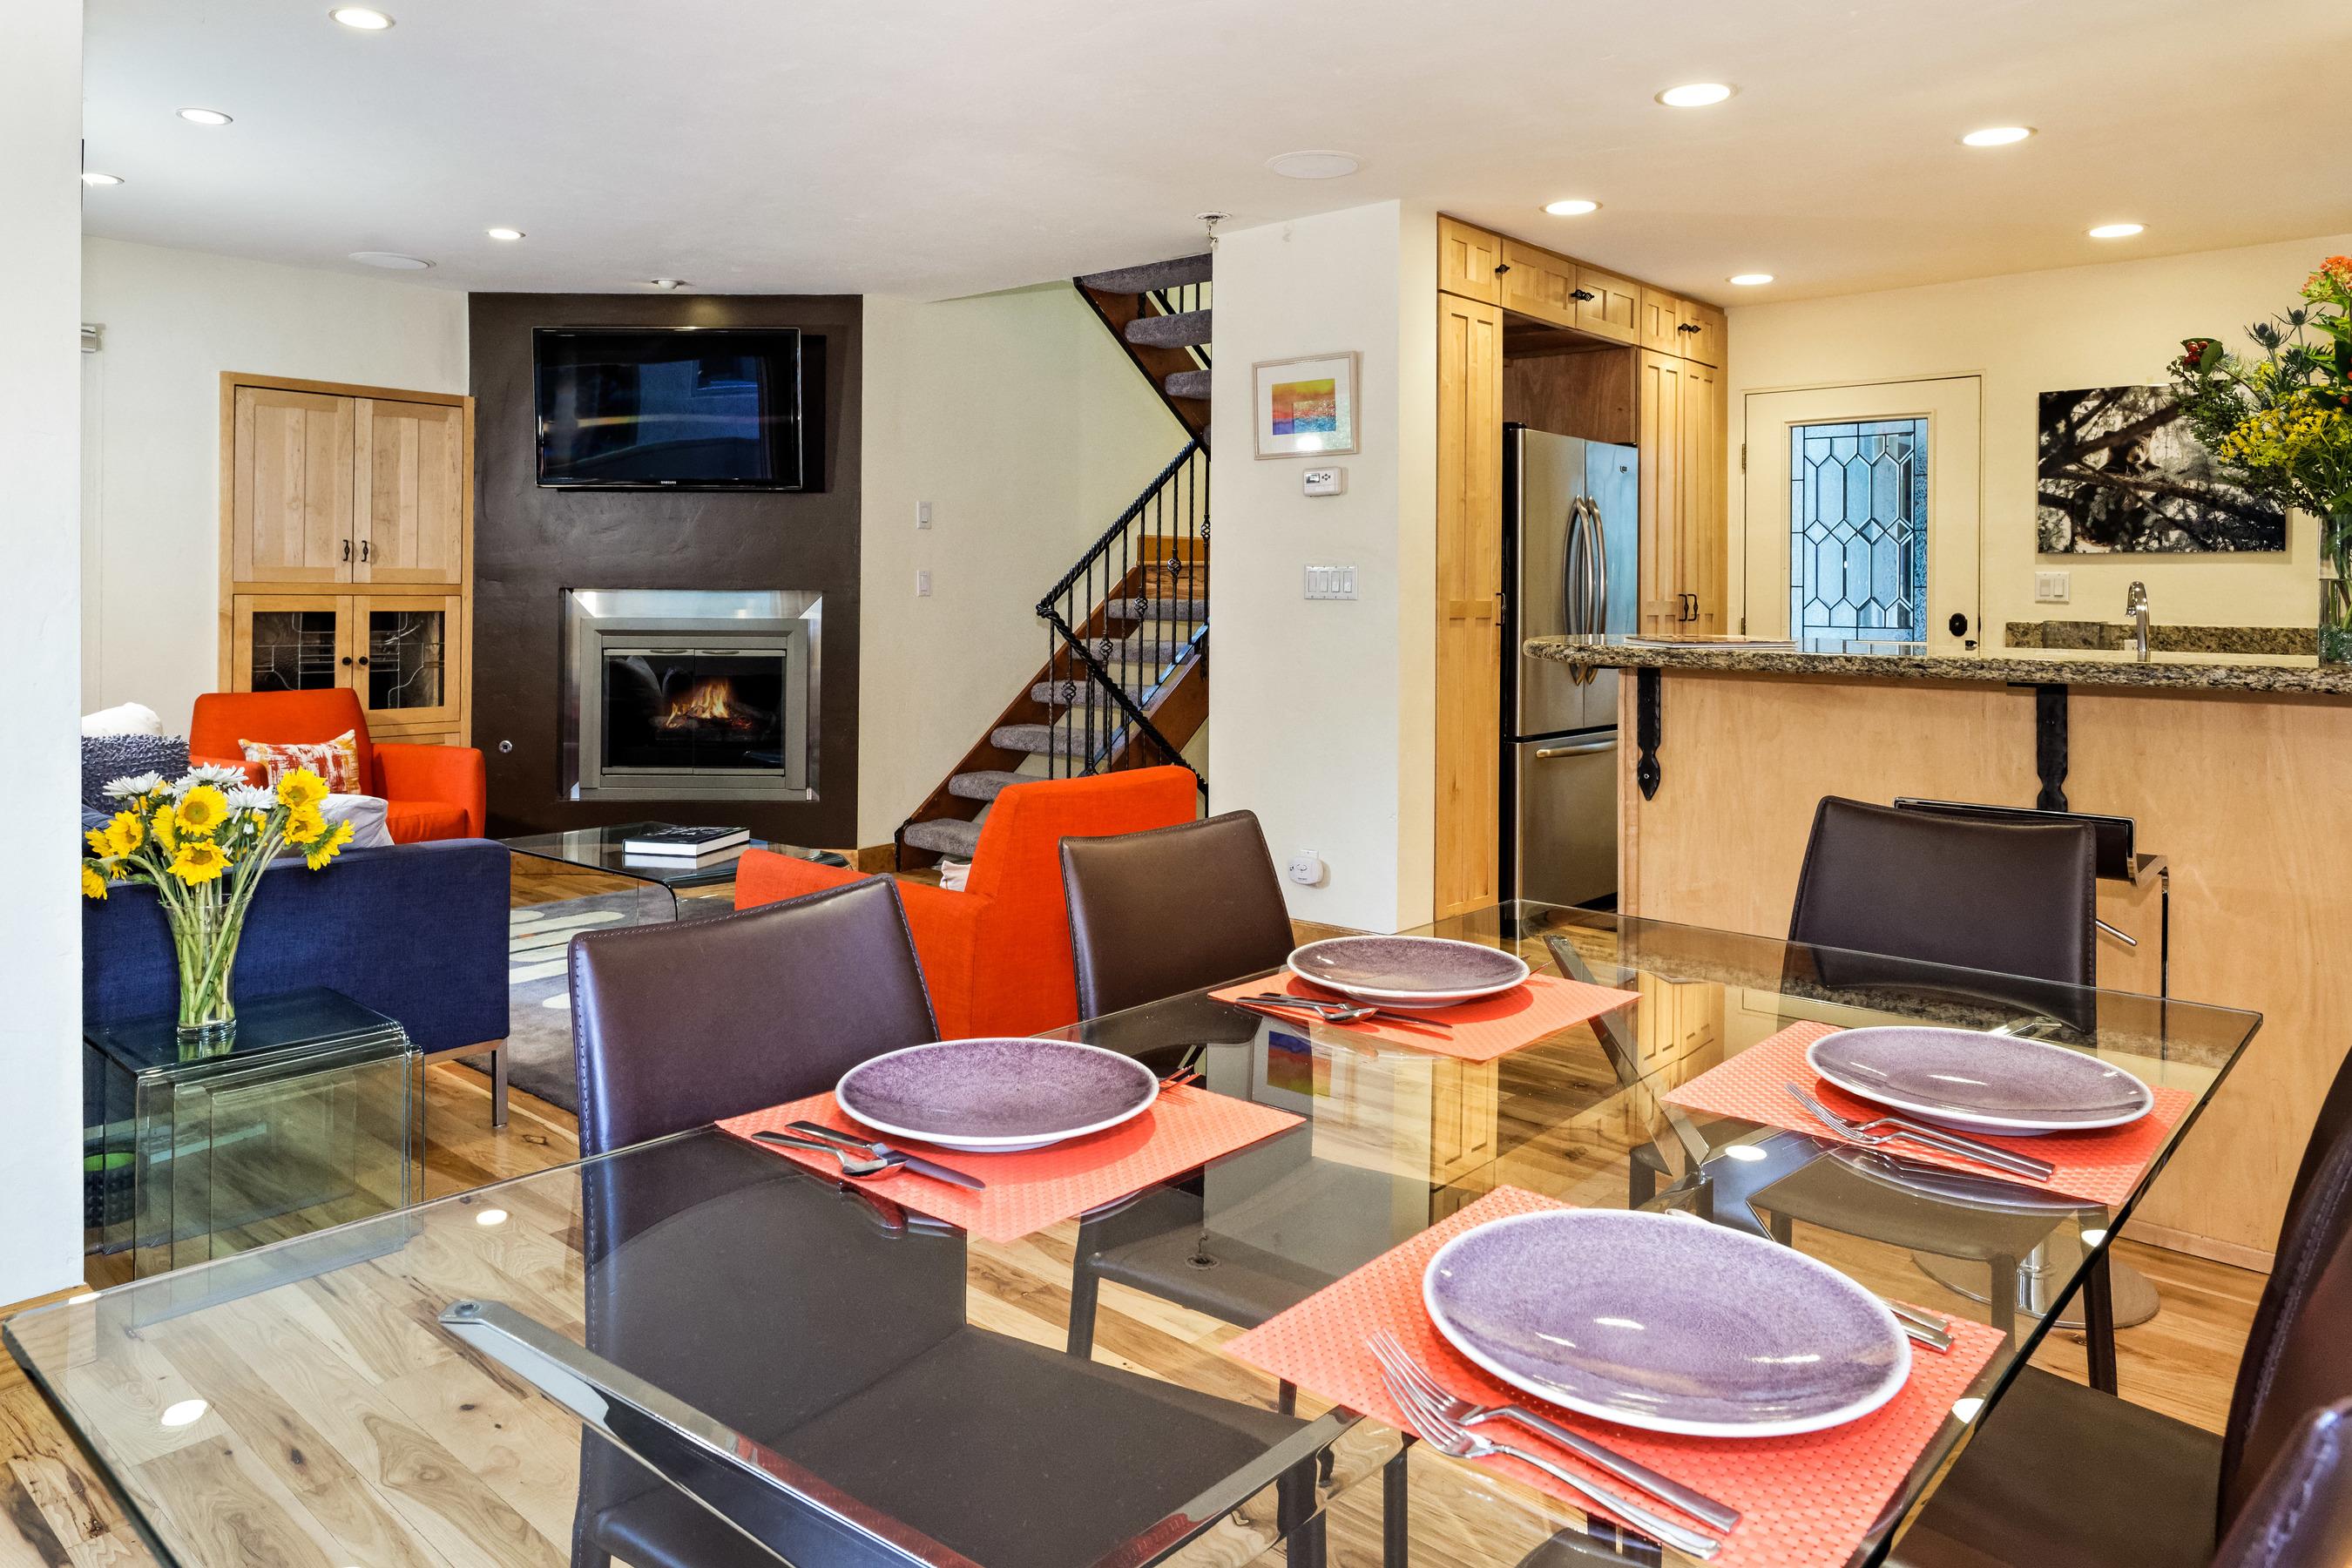 Casa Unifamiliar Adosada por un Venta en 814 W. Bleeker Place 814 W. Bleeker Place Unit B1 Aspen, Colorado, 81611 Estados Unidos